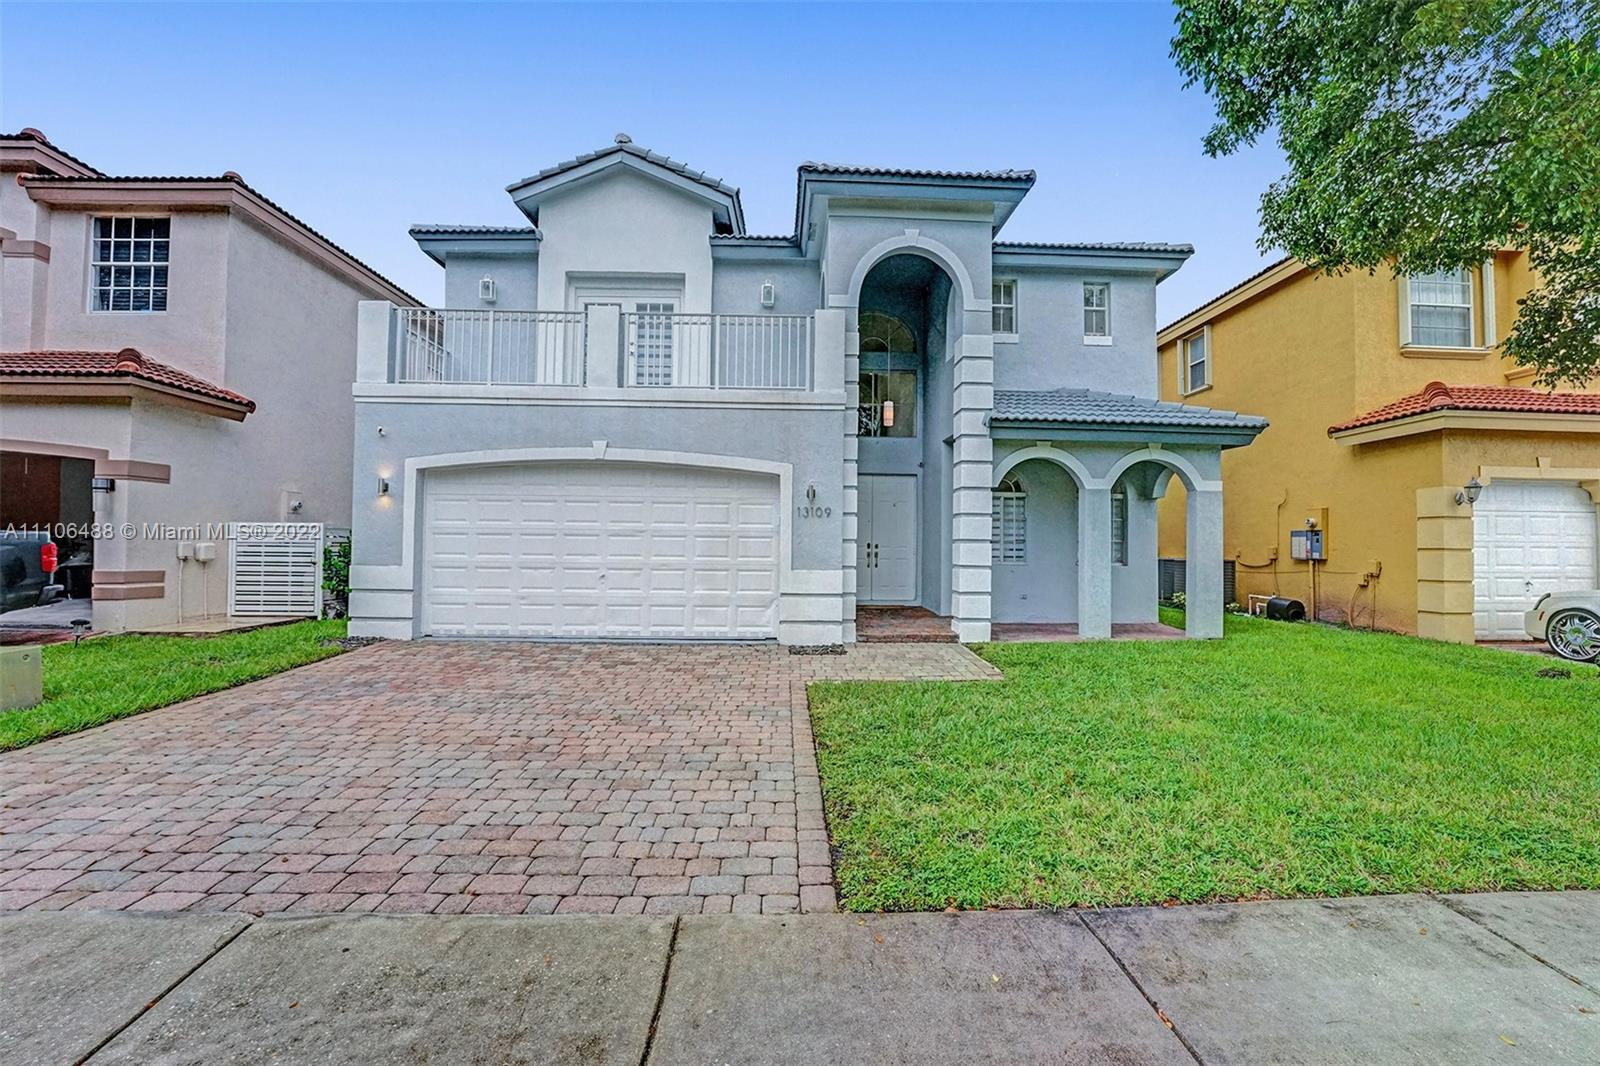 13109 54th Ct, Miramar, Florida 33027